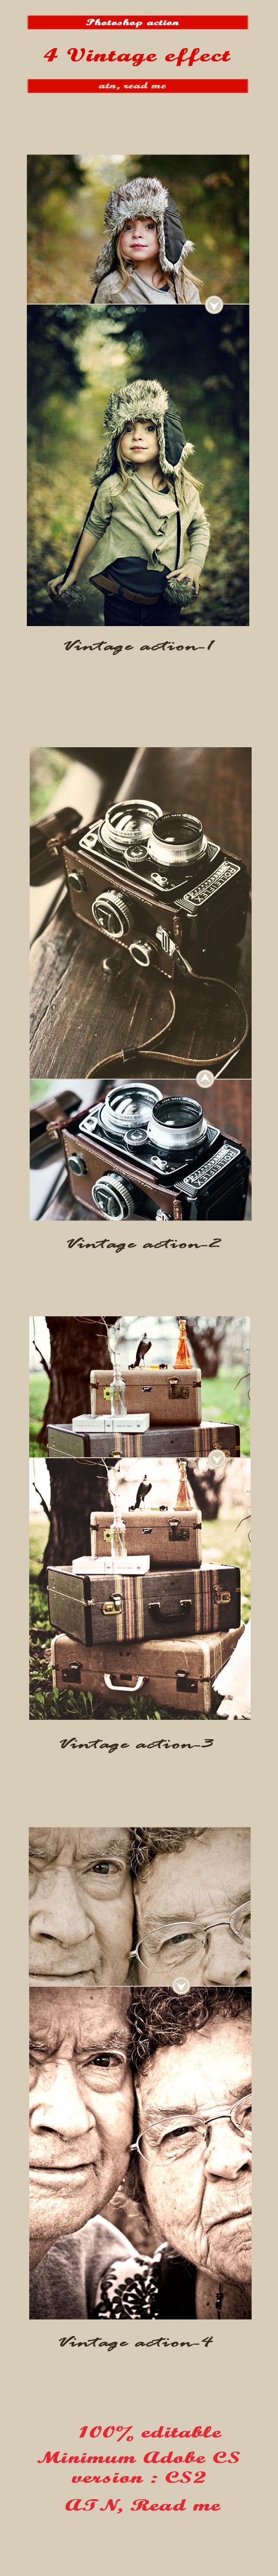 GraphicRiver 4 Vintage Photo Effect 11726784